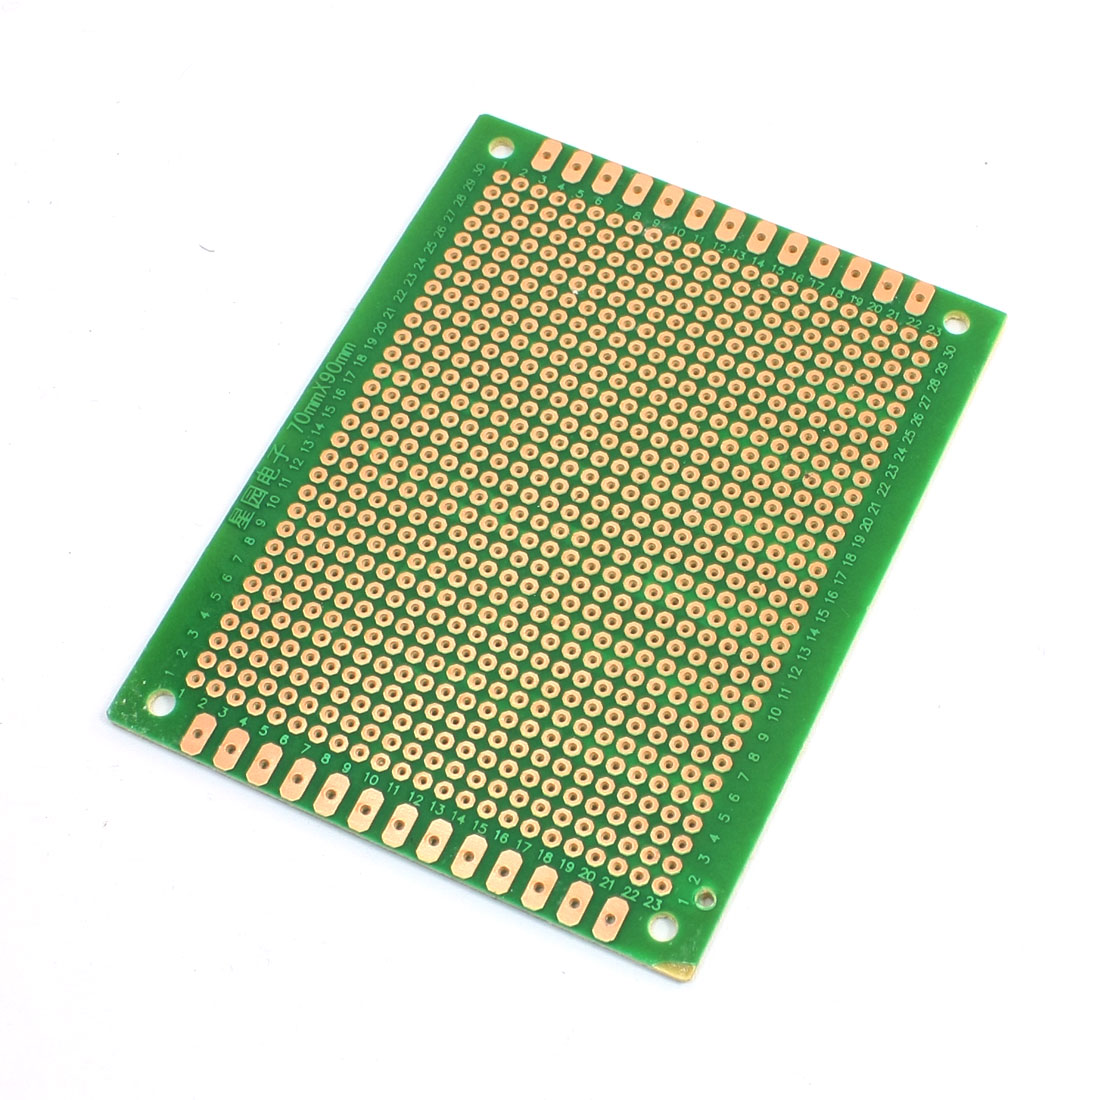 70mm x 90mm Universal Prototype PCB Matrix FR-4 Fiber Circuit Board